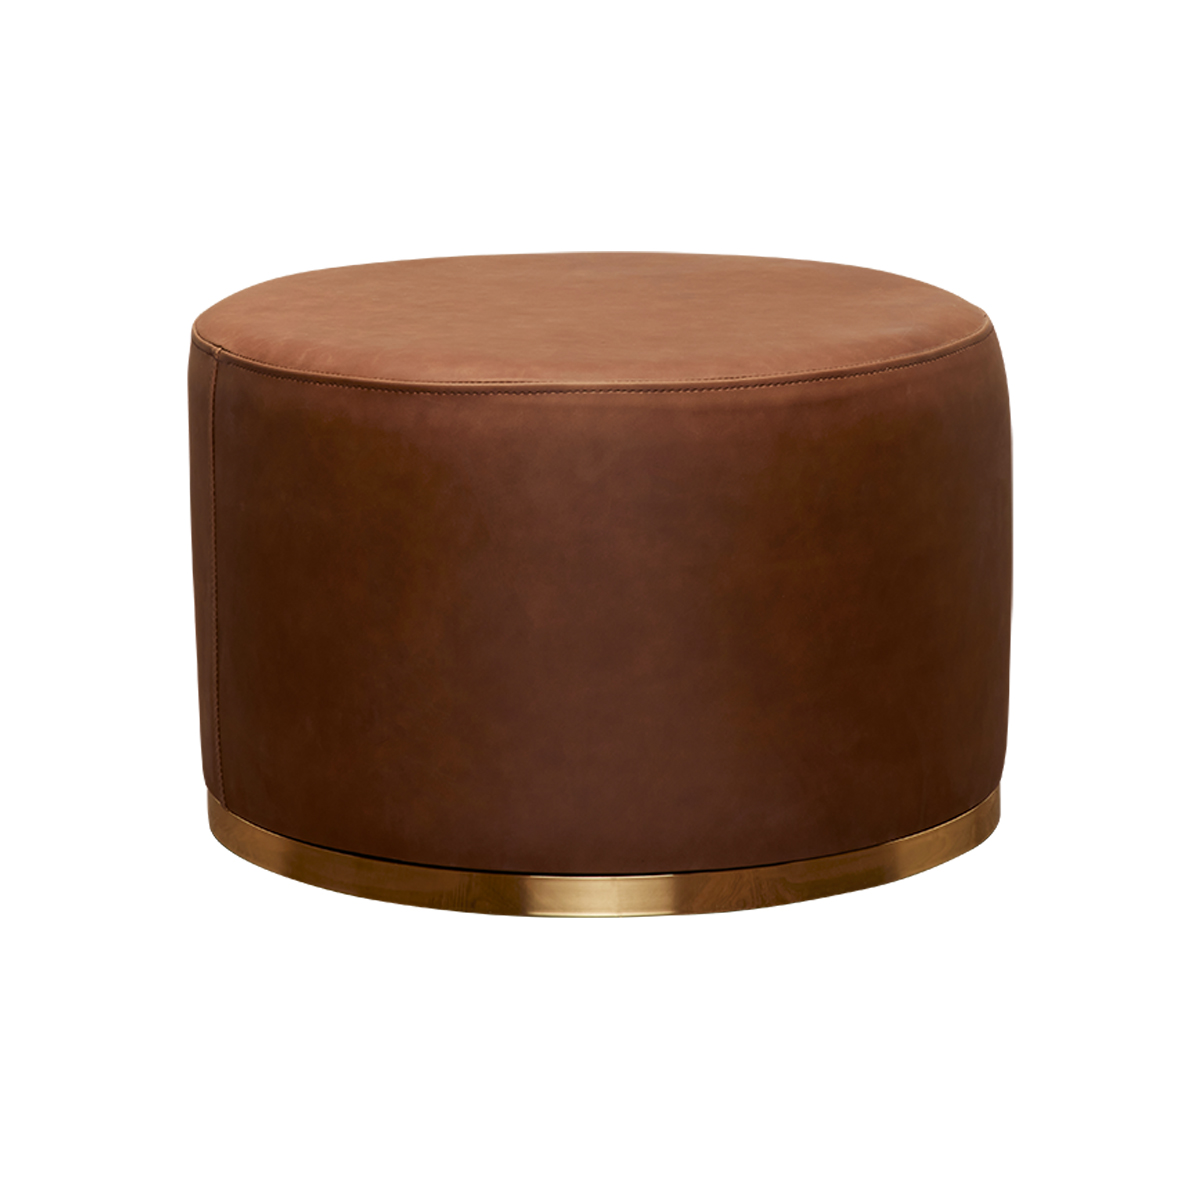 Cara Ottoman – Brown Leather